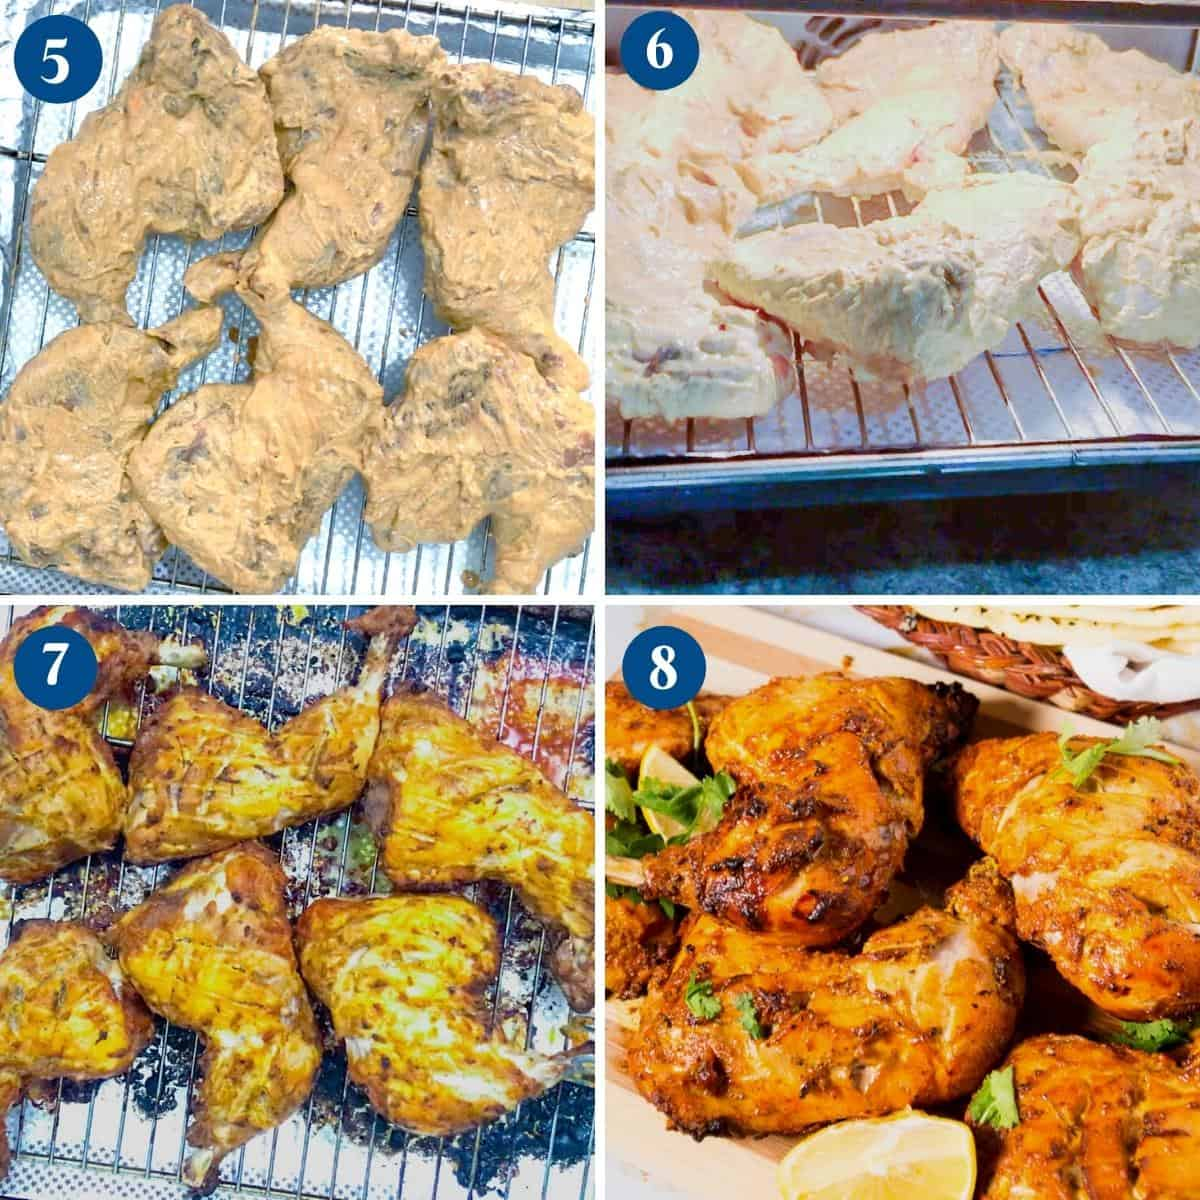 Progress pictures for chicken tandoori.